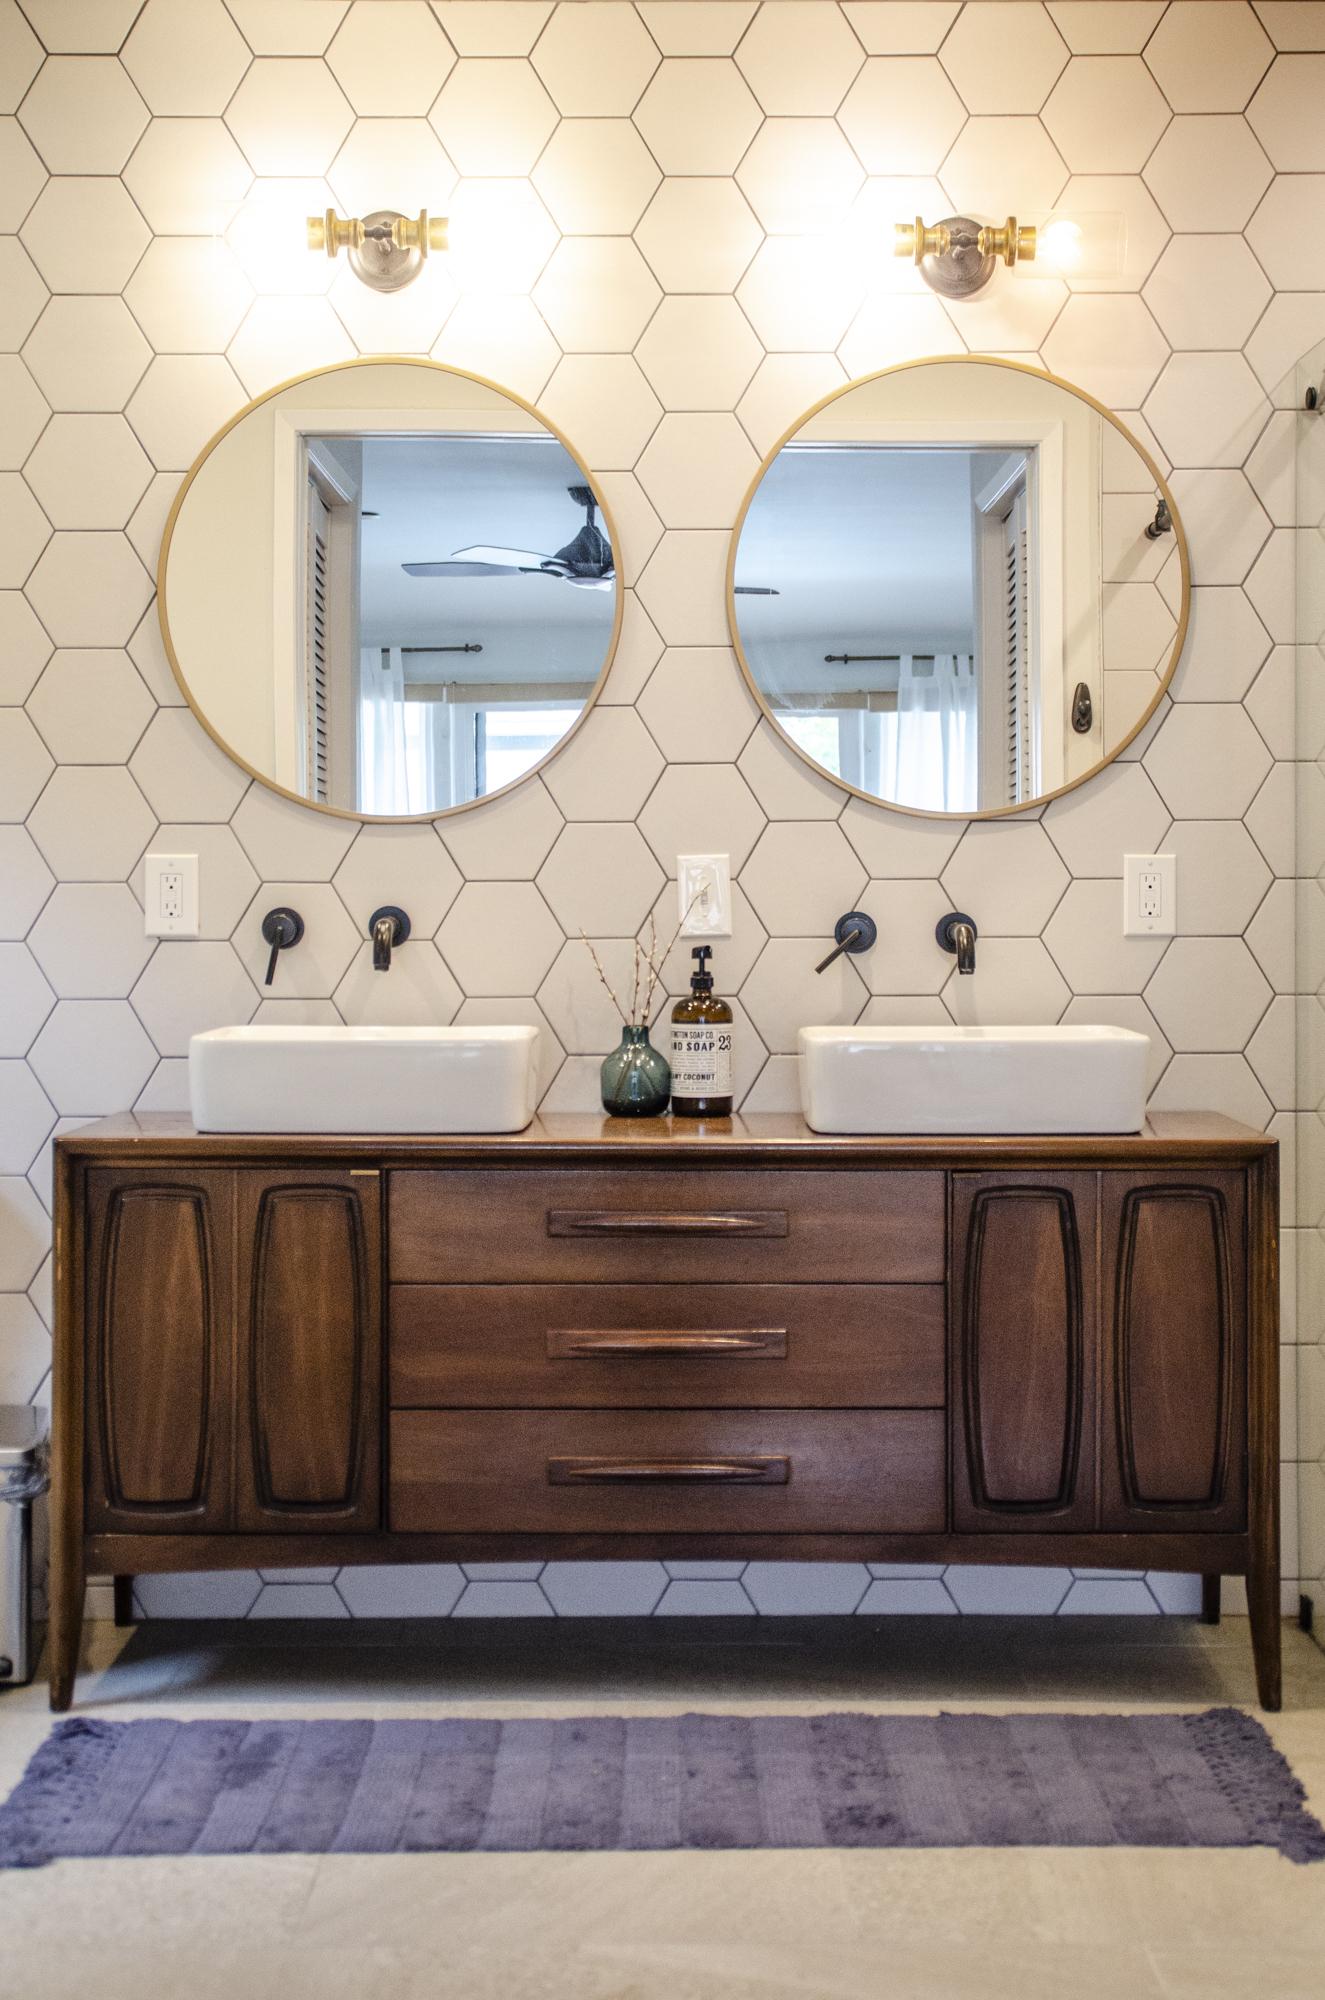 Hexagon tile (splurge) and faux brass mirrors (un-splurge)